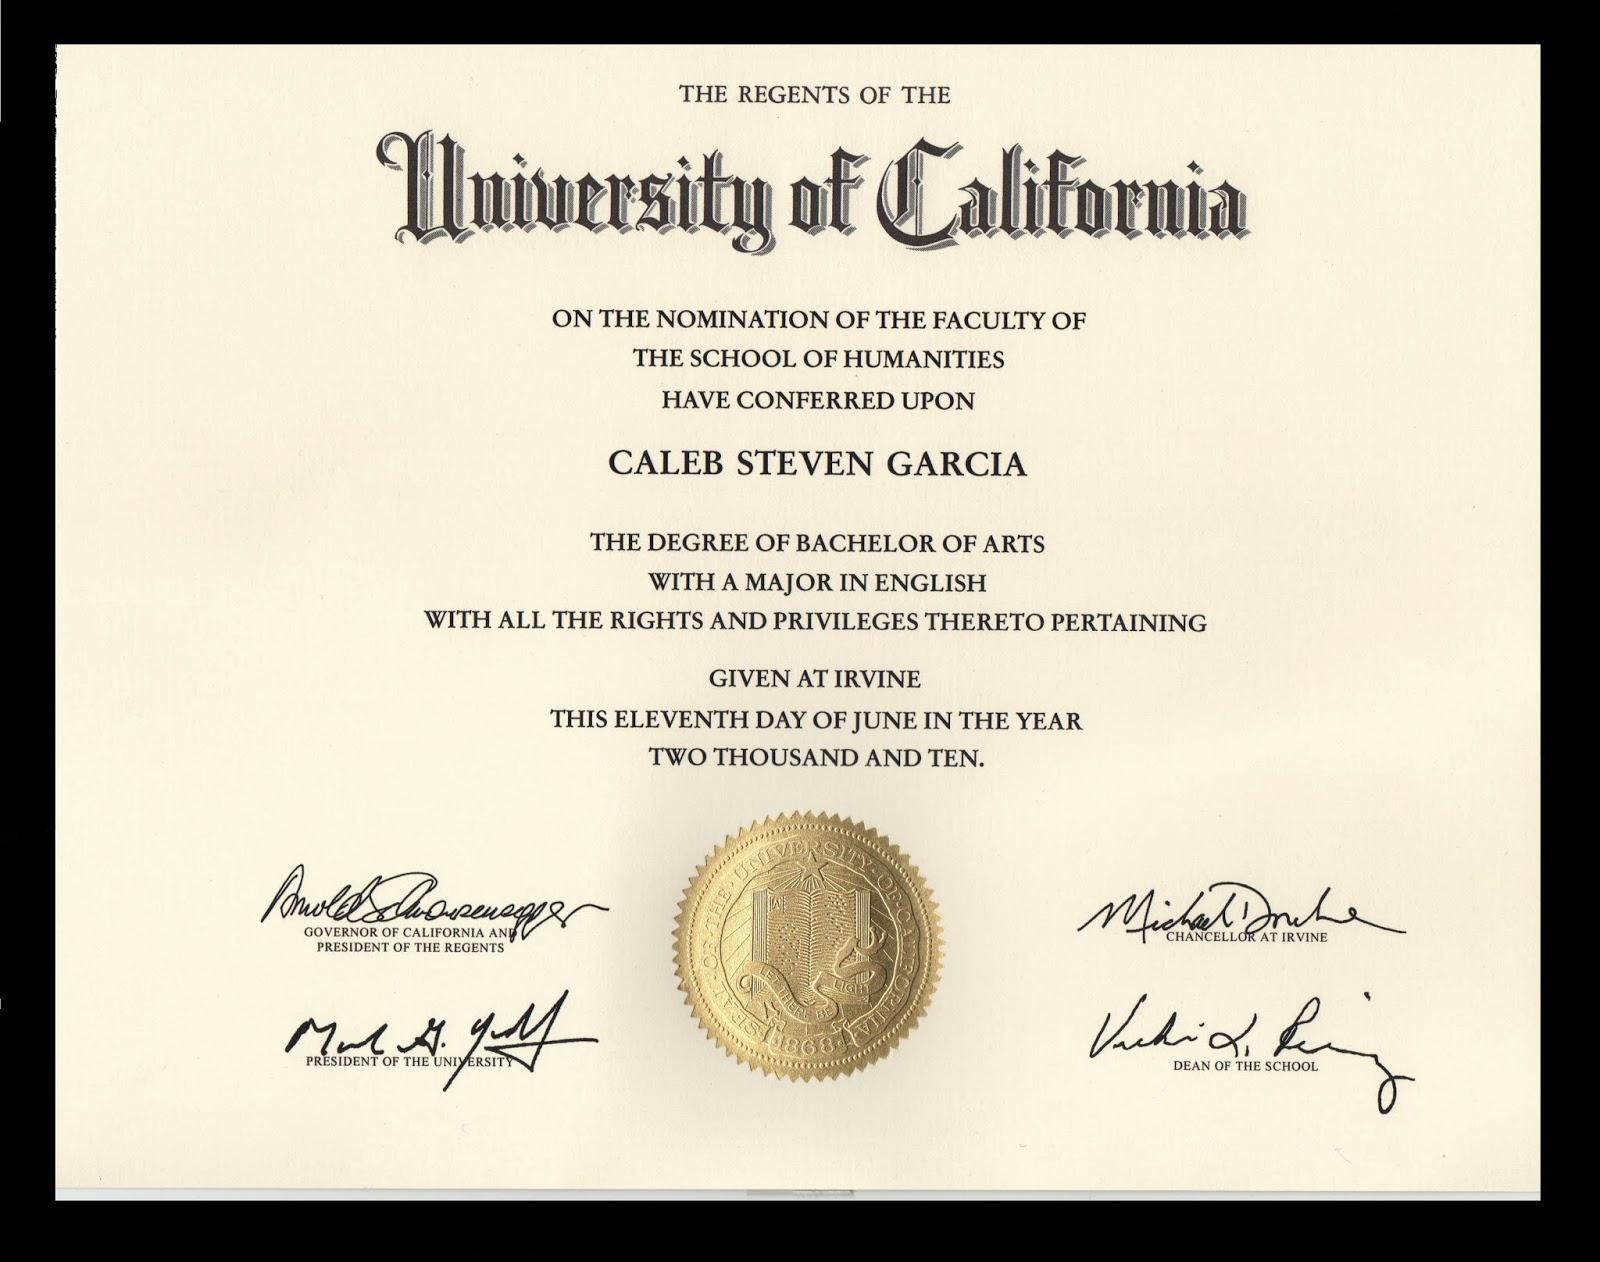 Caleb S Garcia Uci Diploma